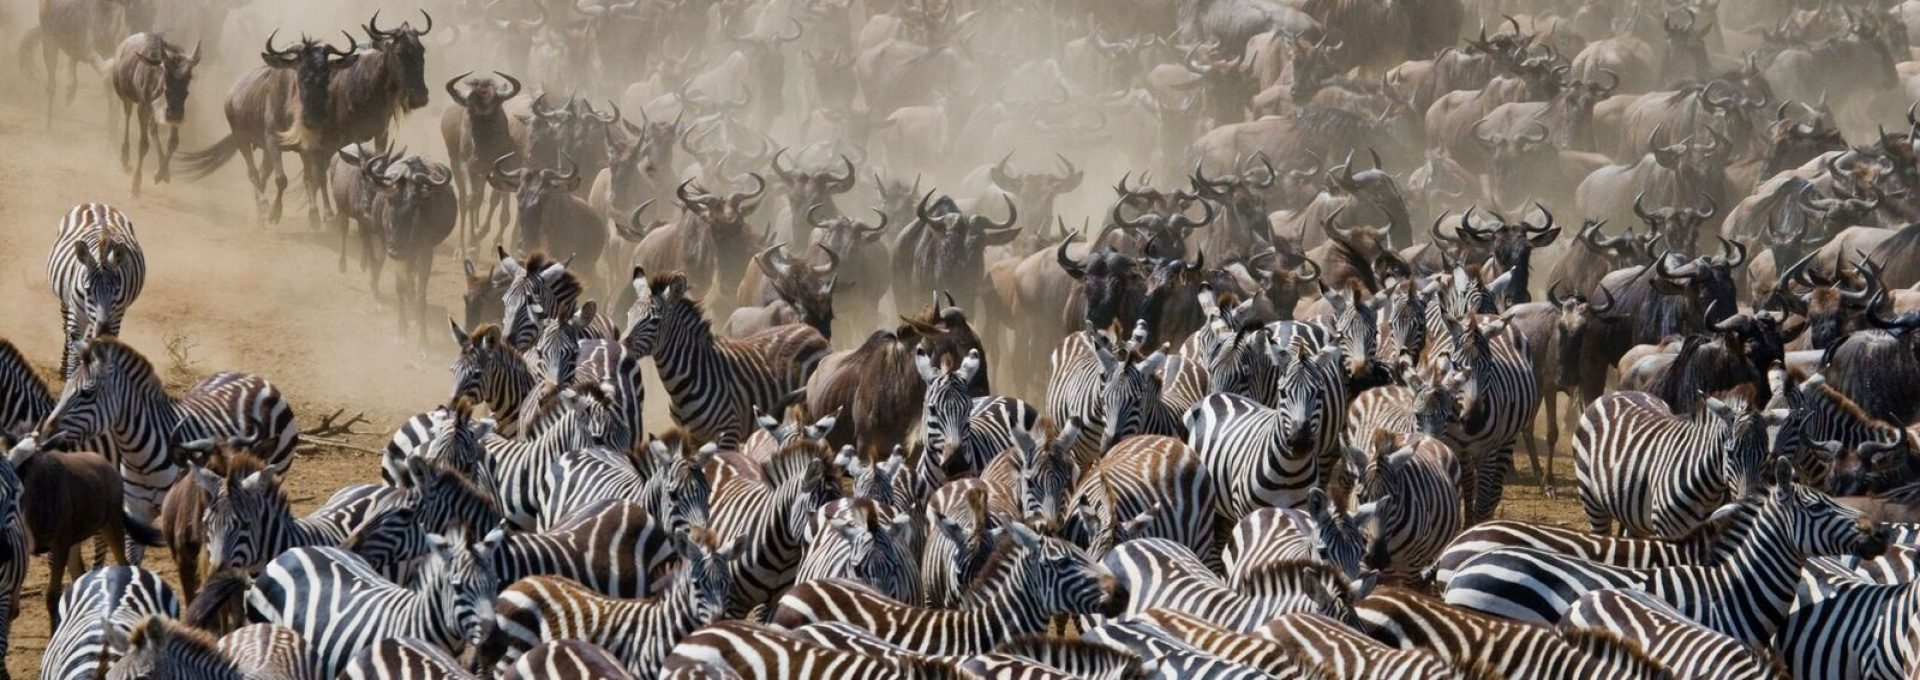 Serengeti Safari Tour